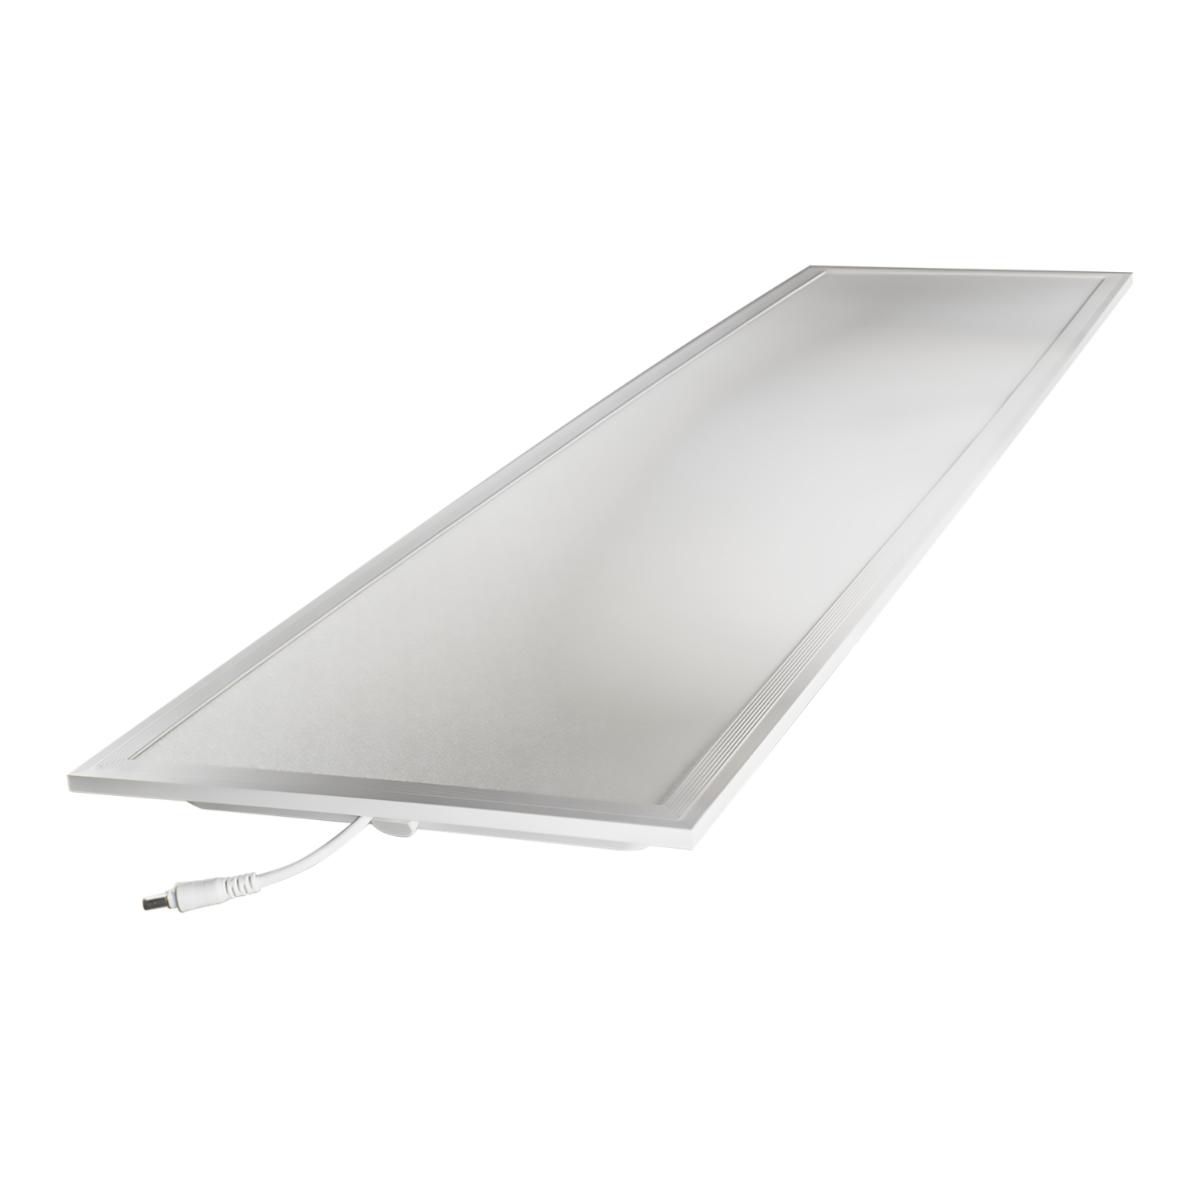 Noxion LED Panel Delta Pro V2.0 Xitanium DALI 30W 30x120cm 4000K 4110lm UGR <19 | Dali Dimmable - Cool White - Replaces 2x36W